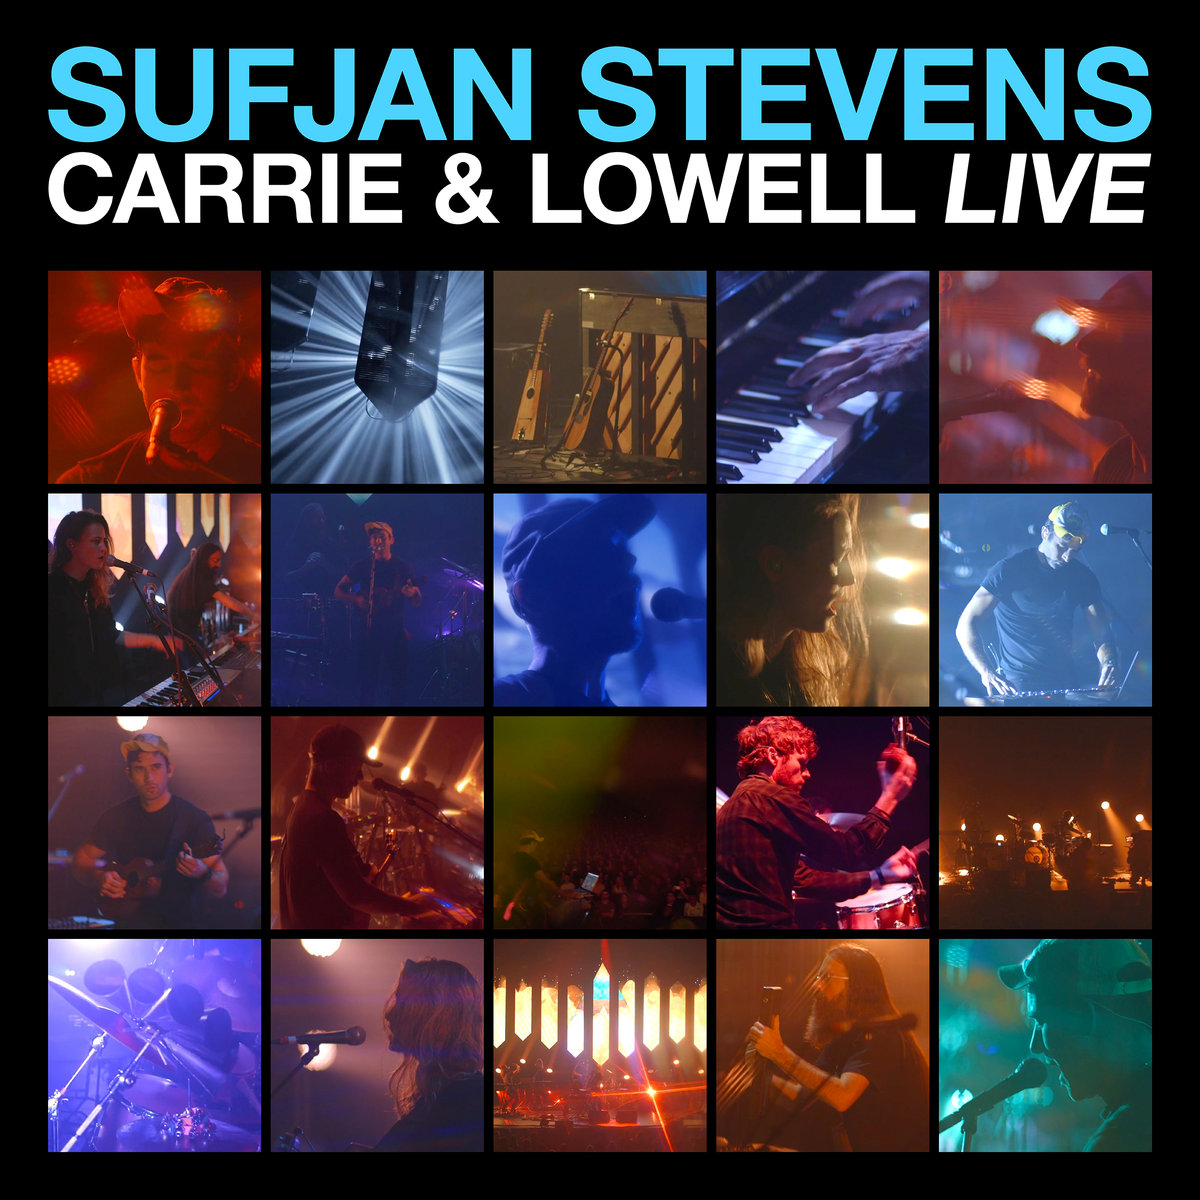 a2326344251 10 Sufjan Stevens releases Carrie & Lowell Live album: Stream/download